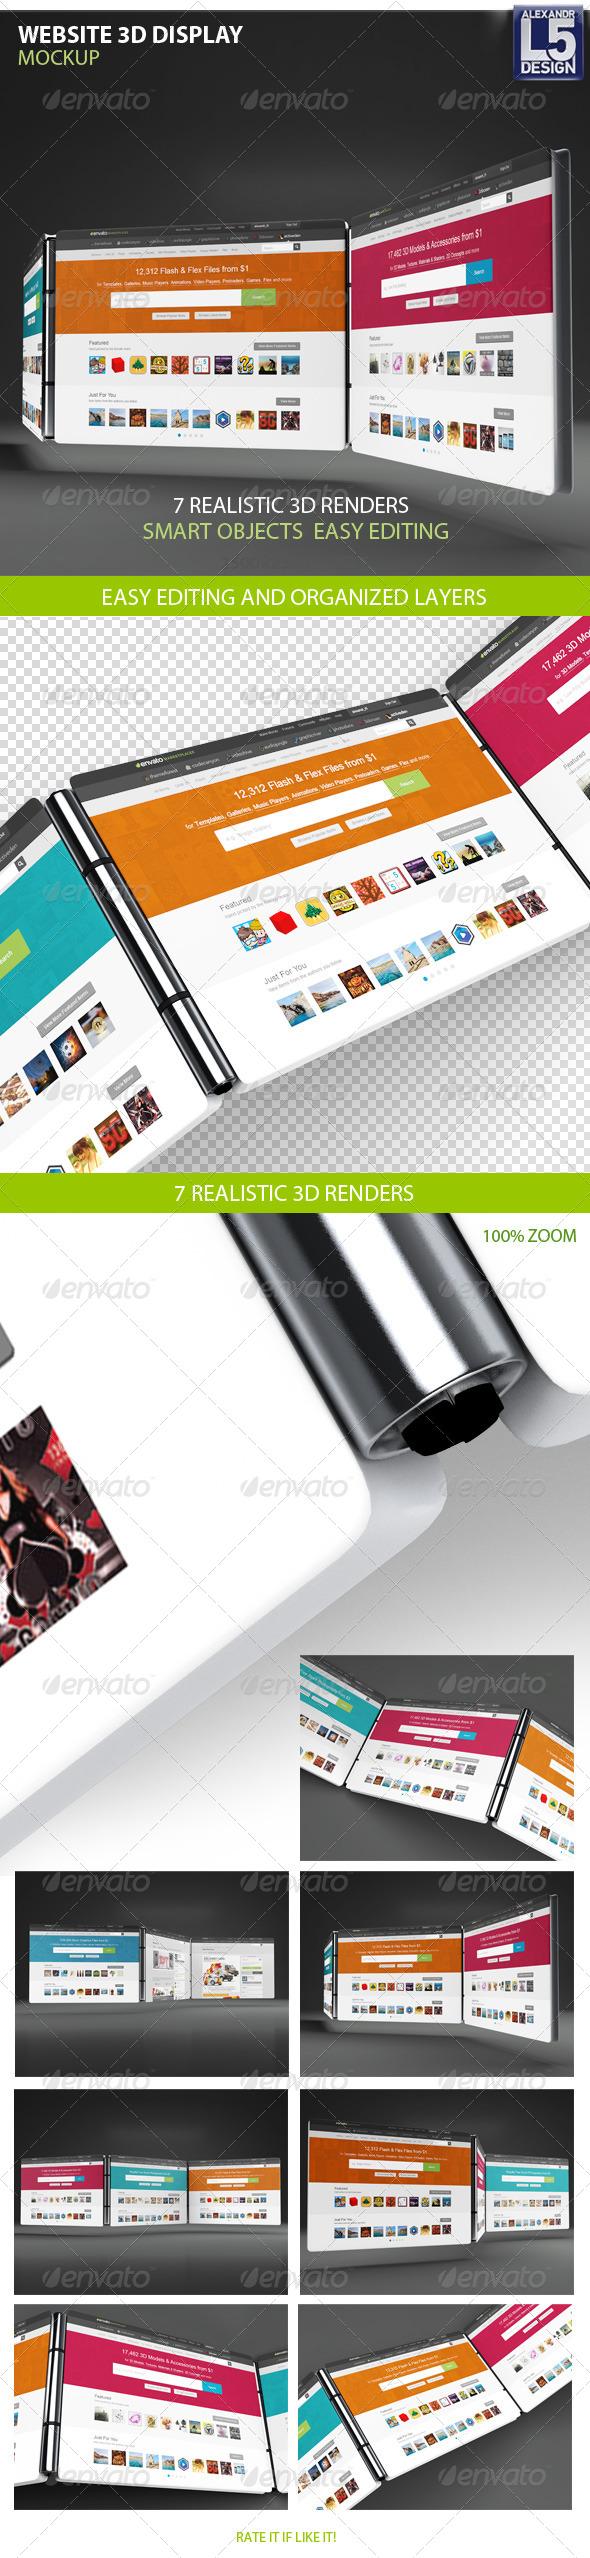 Website 3d Display Mock-Up - Displays Product Mock-Ups